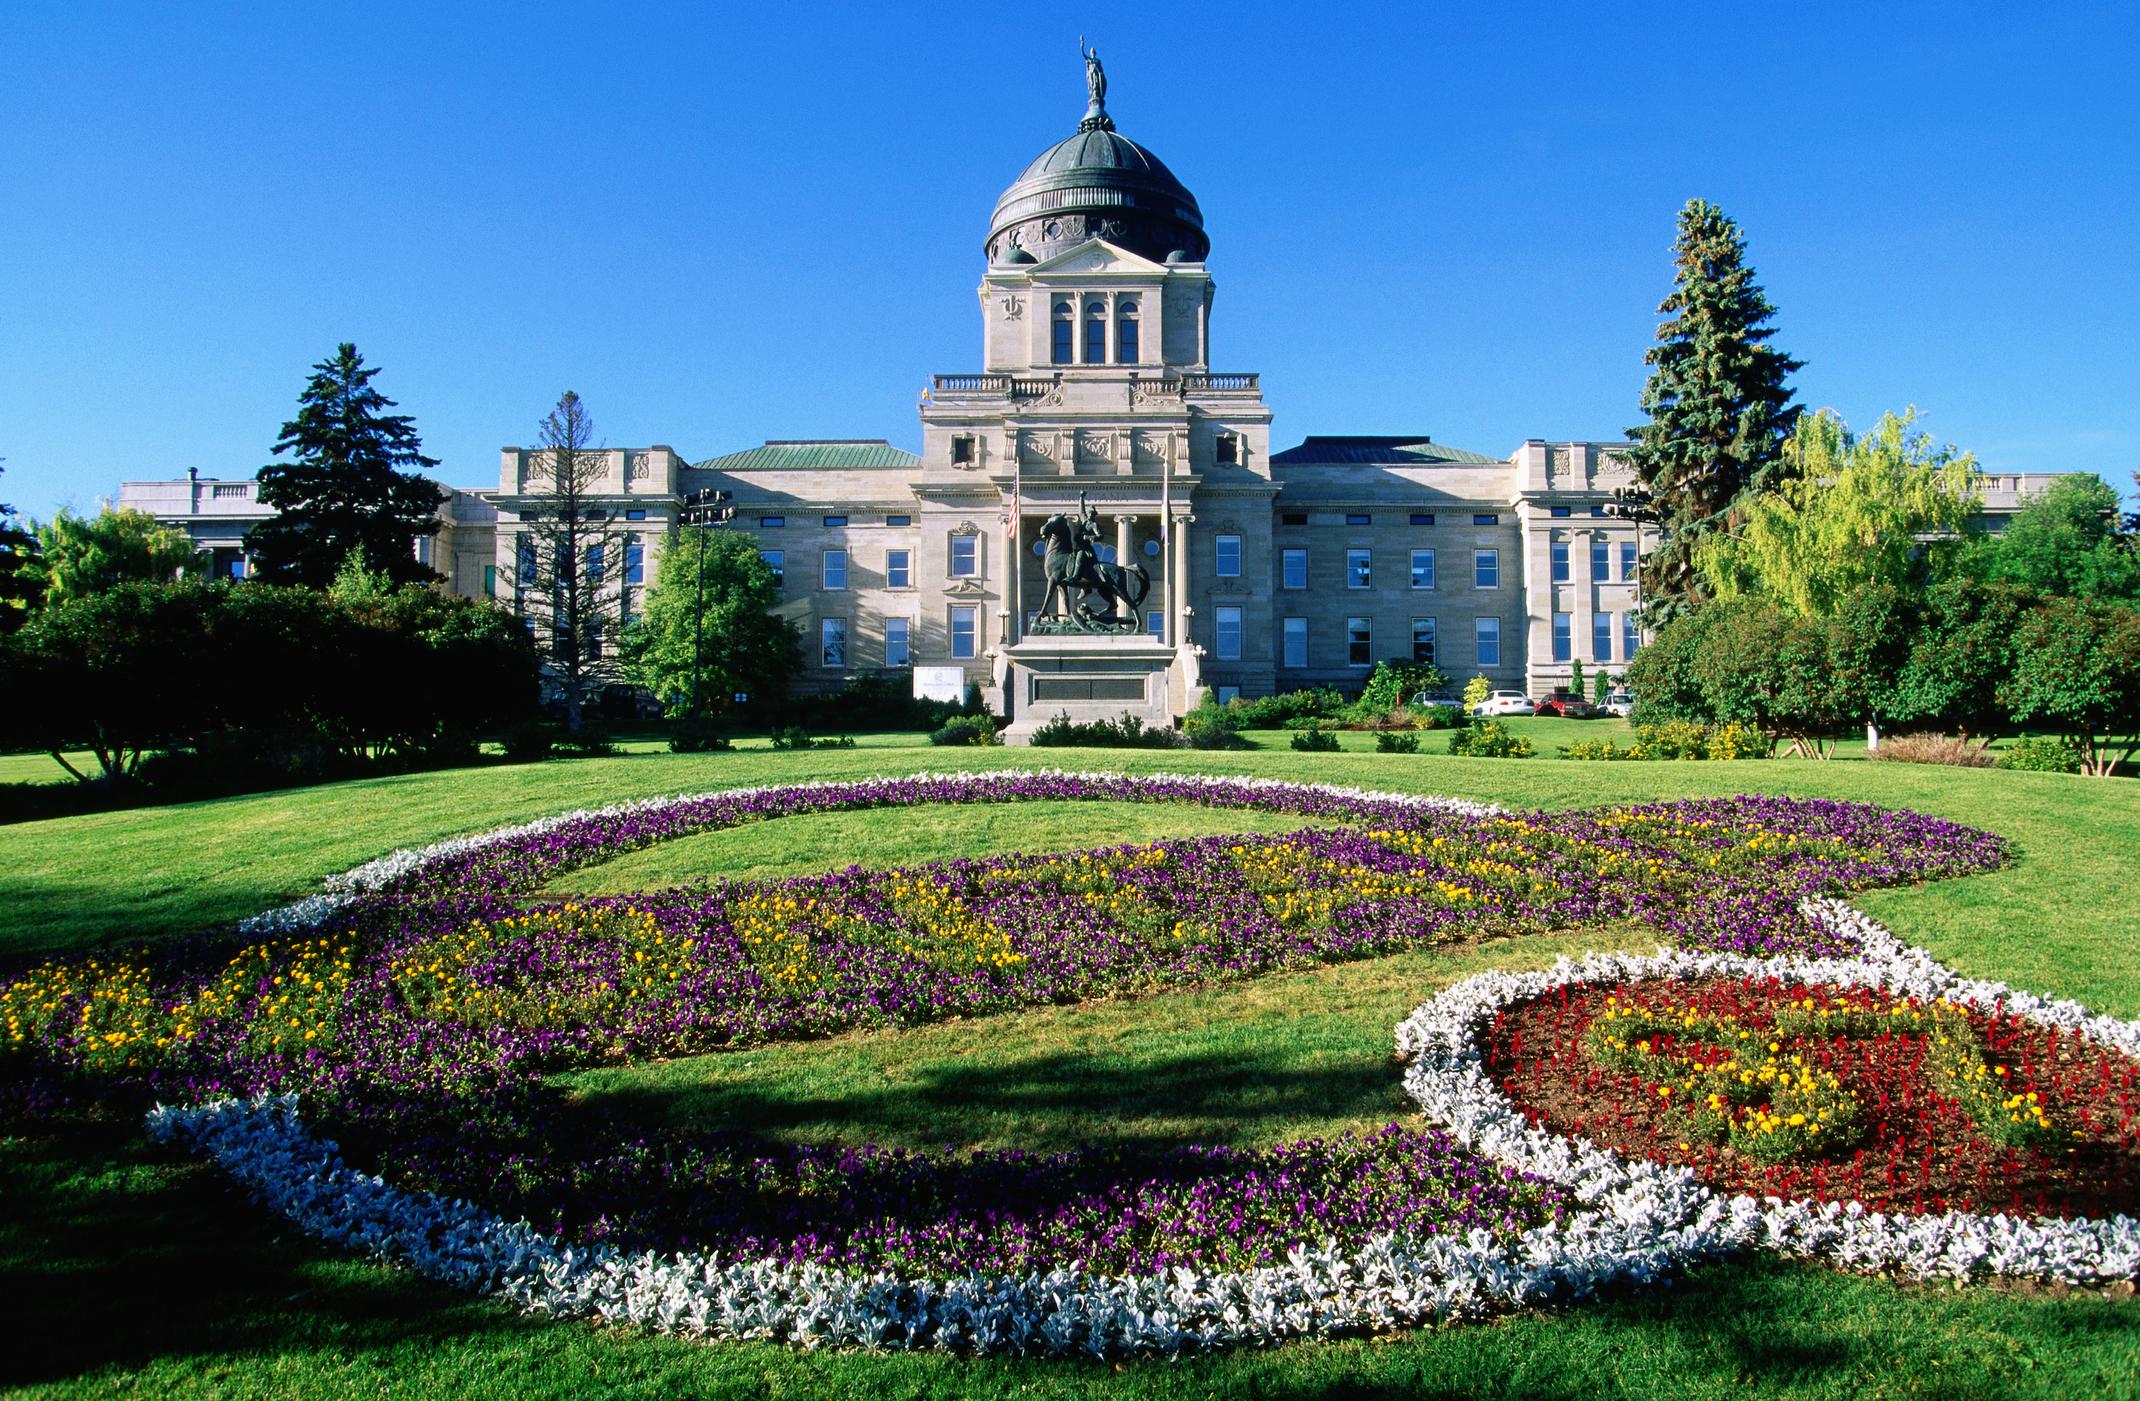 Special legislative committee on judiciary issues subpoenas to Montana Supreme Court